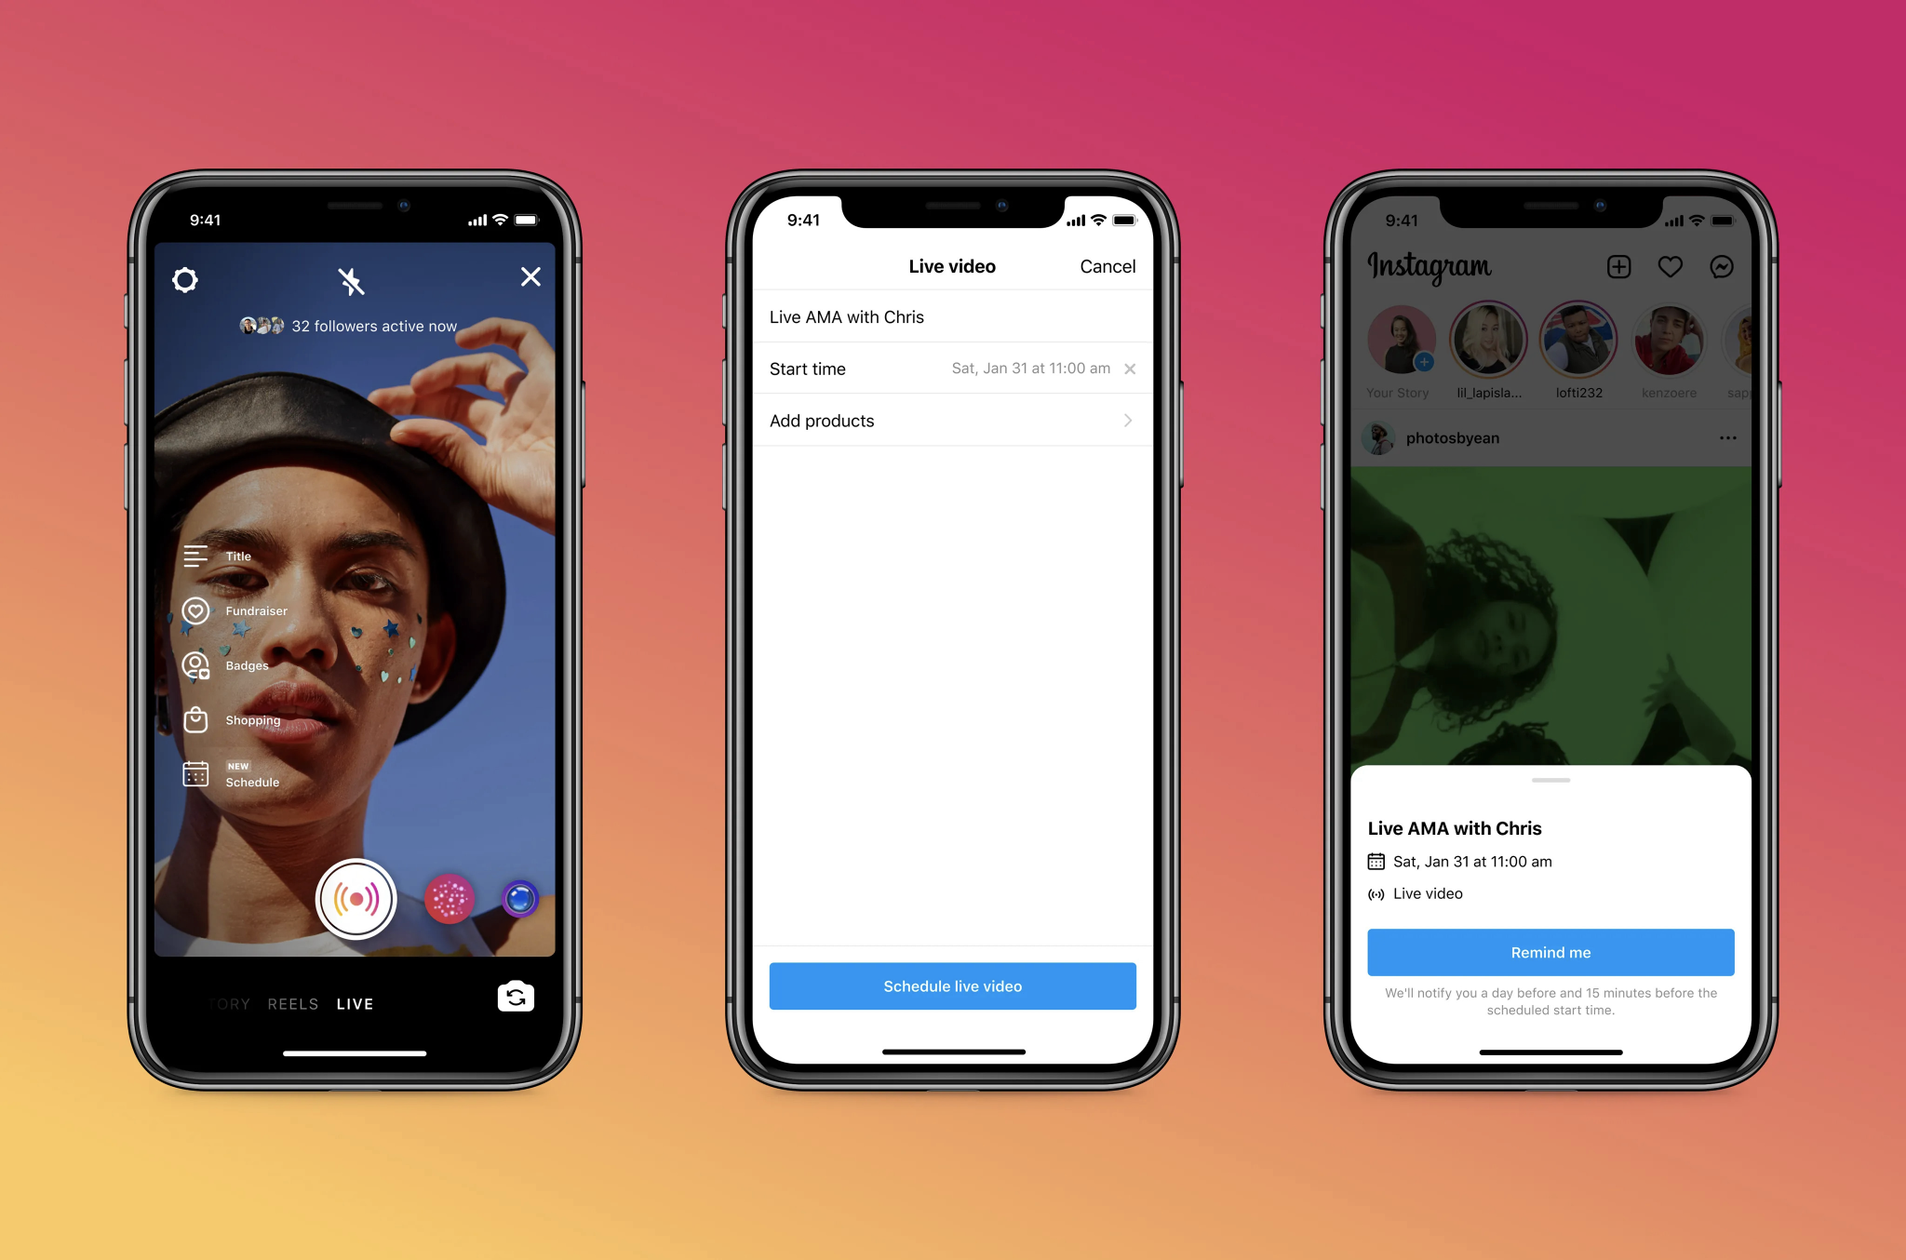 「Instagram」がライブ配信のスケジュールを事前設定して告知できる新機能を導入